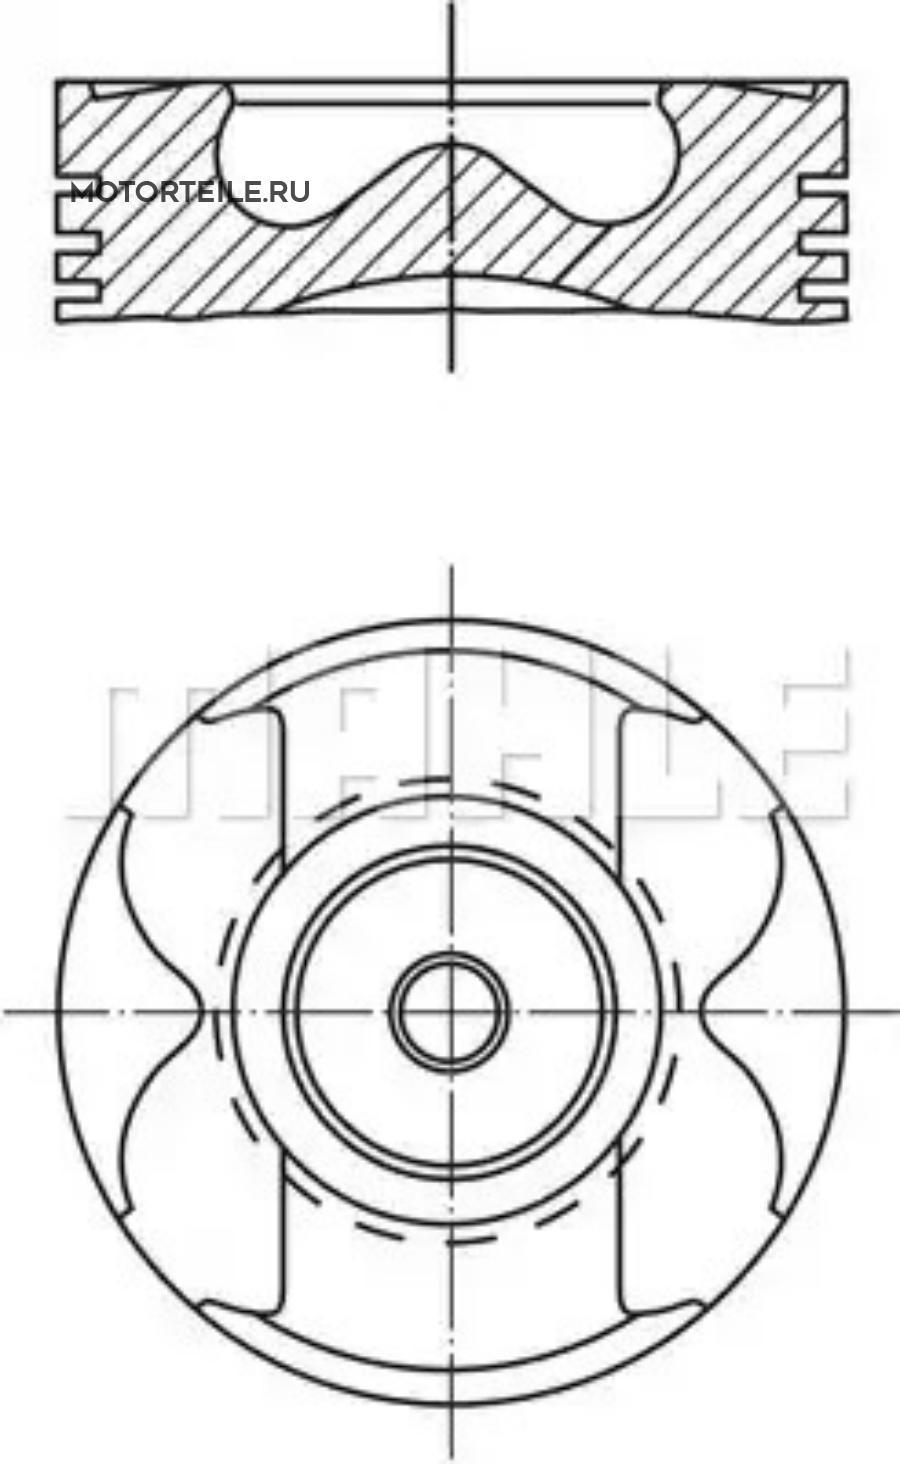 Поршнекомплект MB OM611   OM612   OM613 220D   270D   320D 1999-> d88.0+0.75 (палец 30mm)